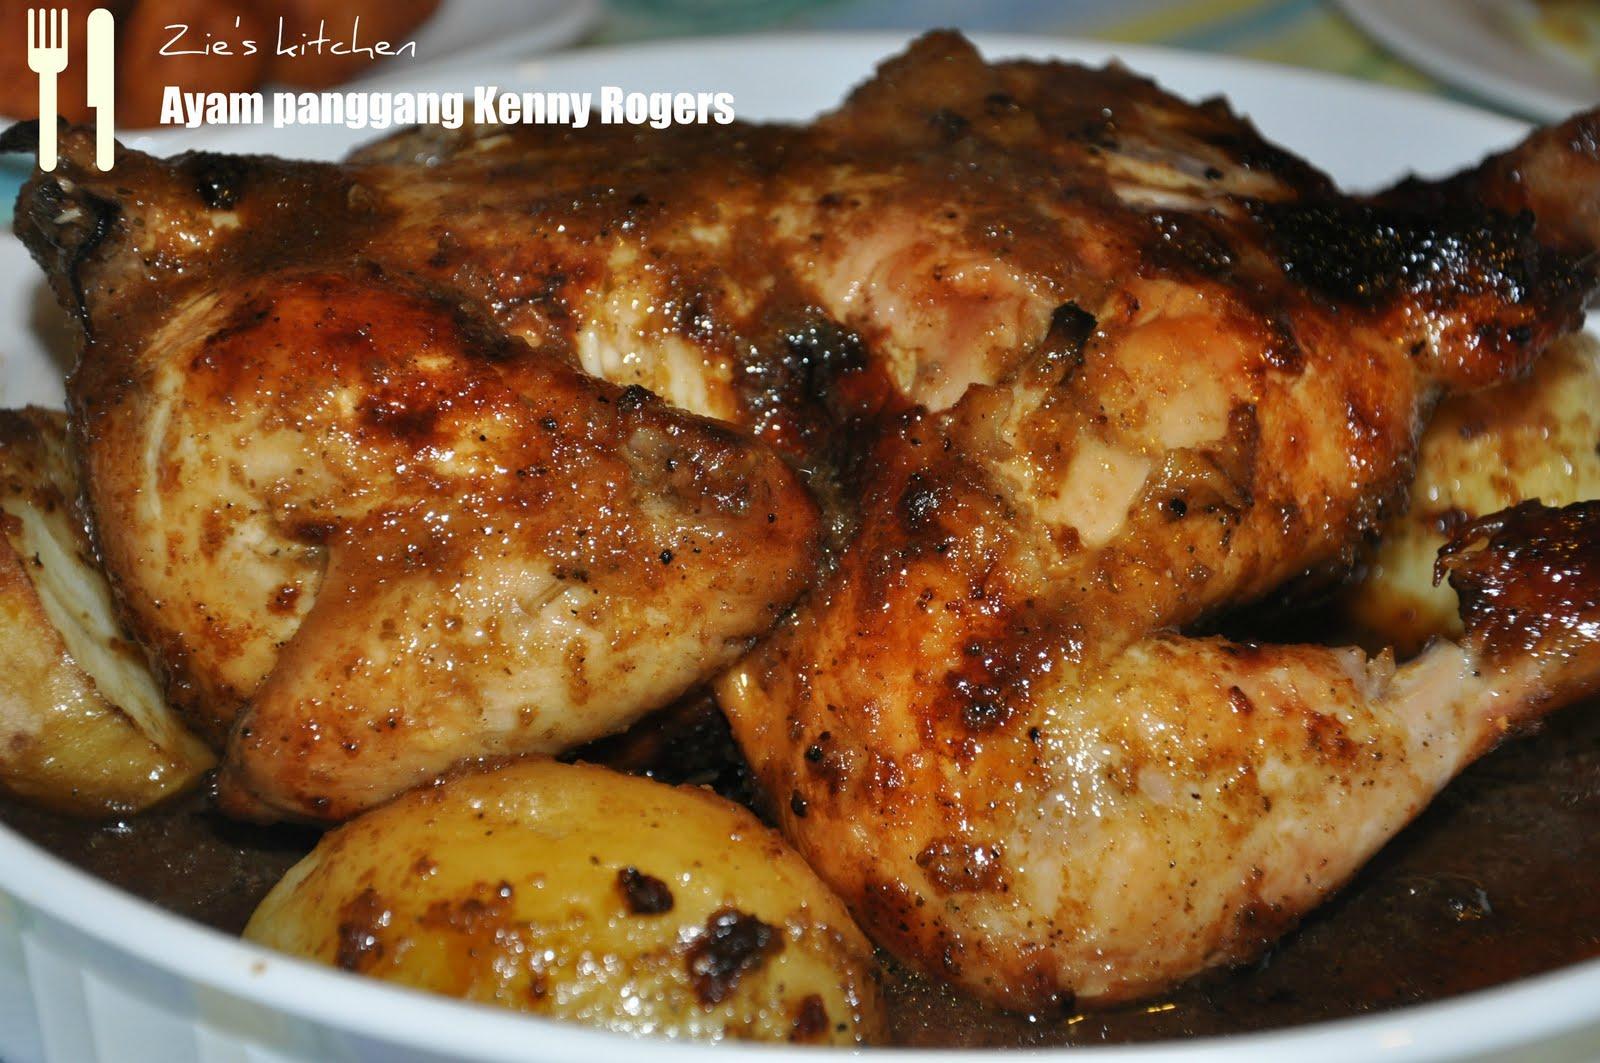 dok makan ayam goreng ayam masak pedas kari ayam dan masakan ayam